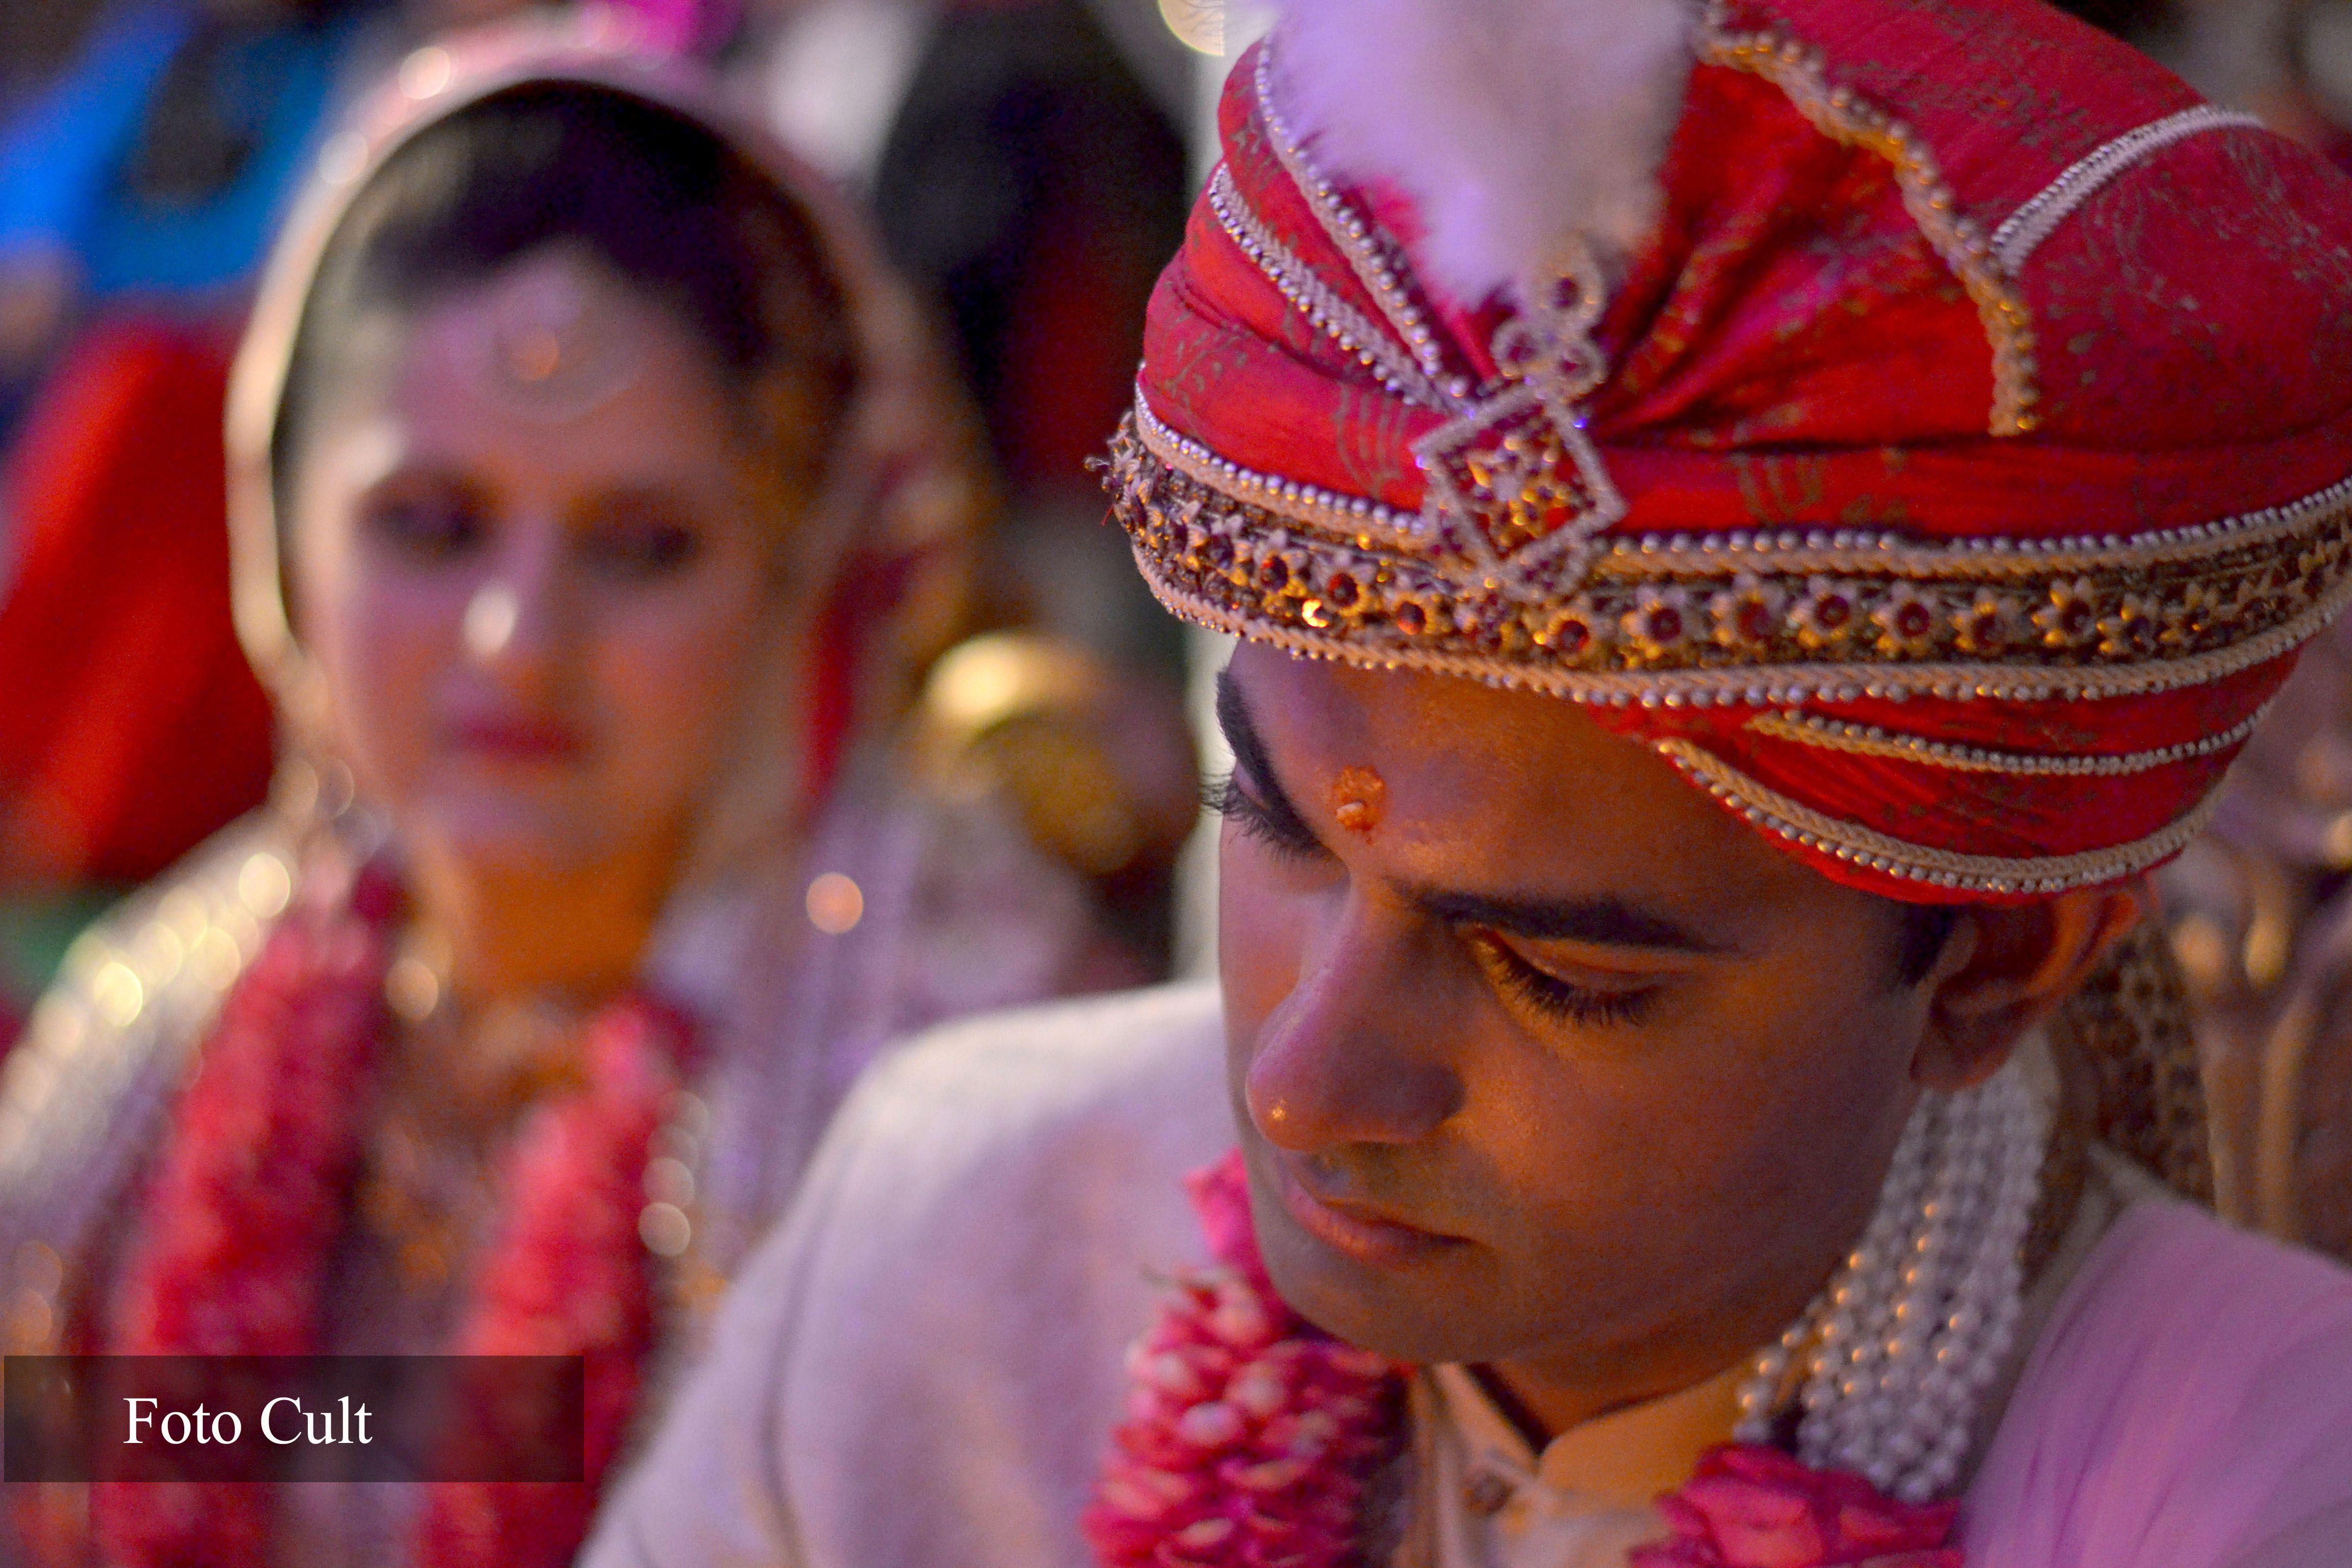 Feras in Indian wedding. Candid Wedding photography.